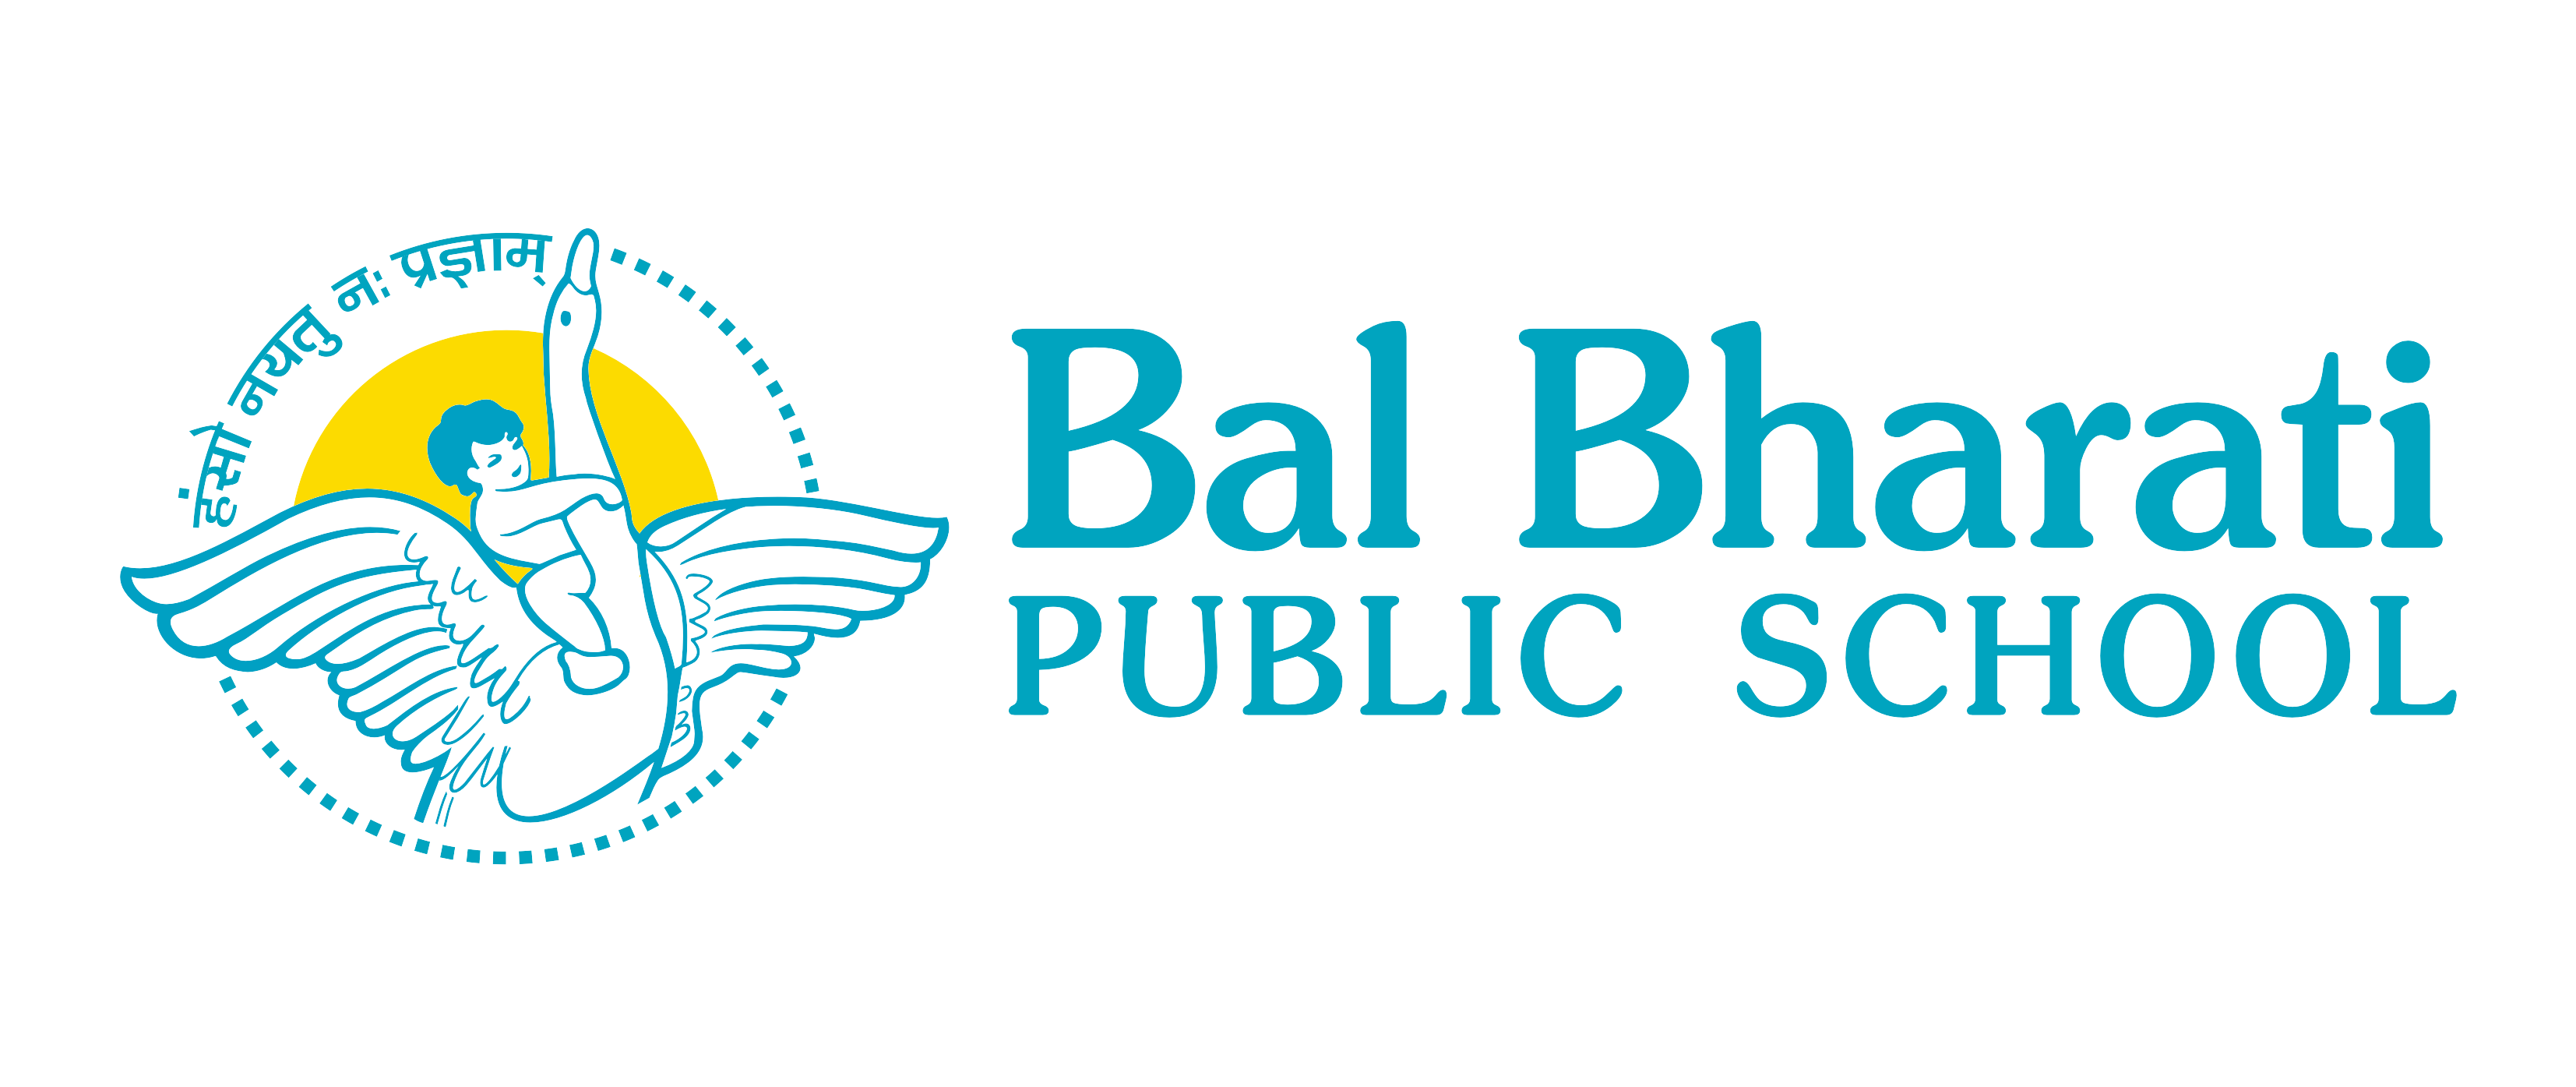 bal bharati public school delhi photos images and